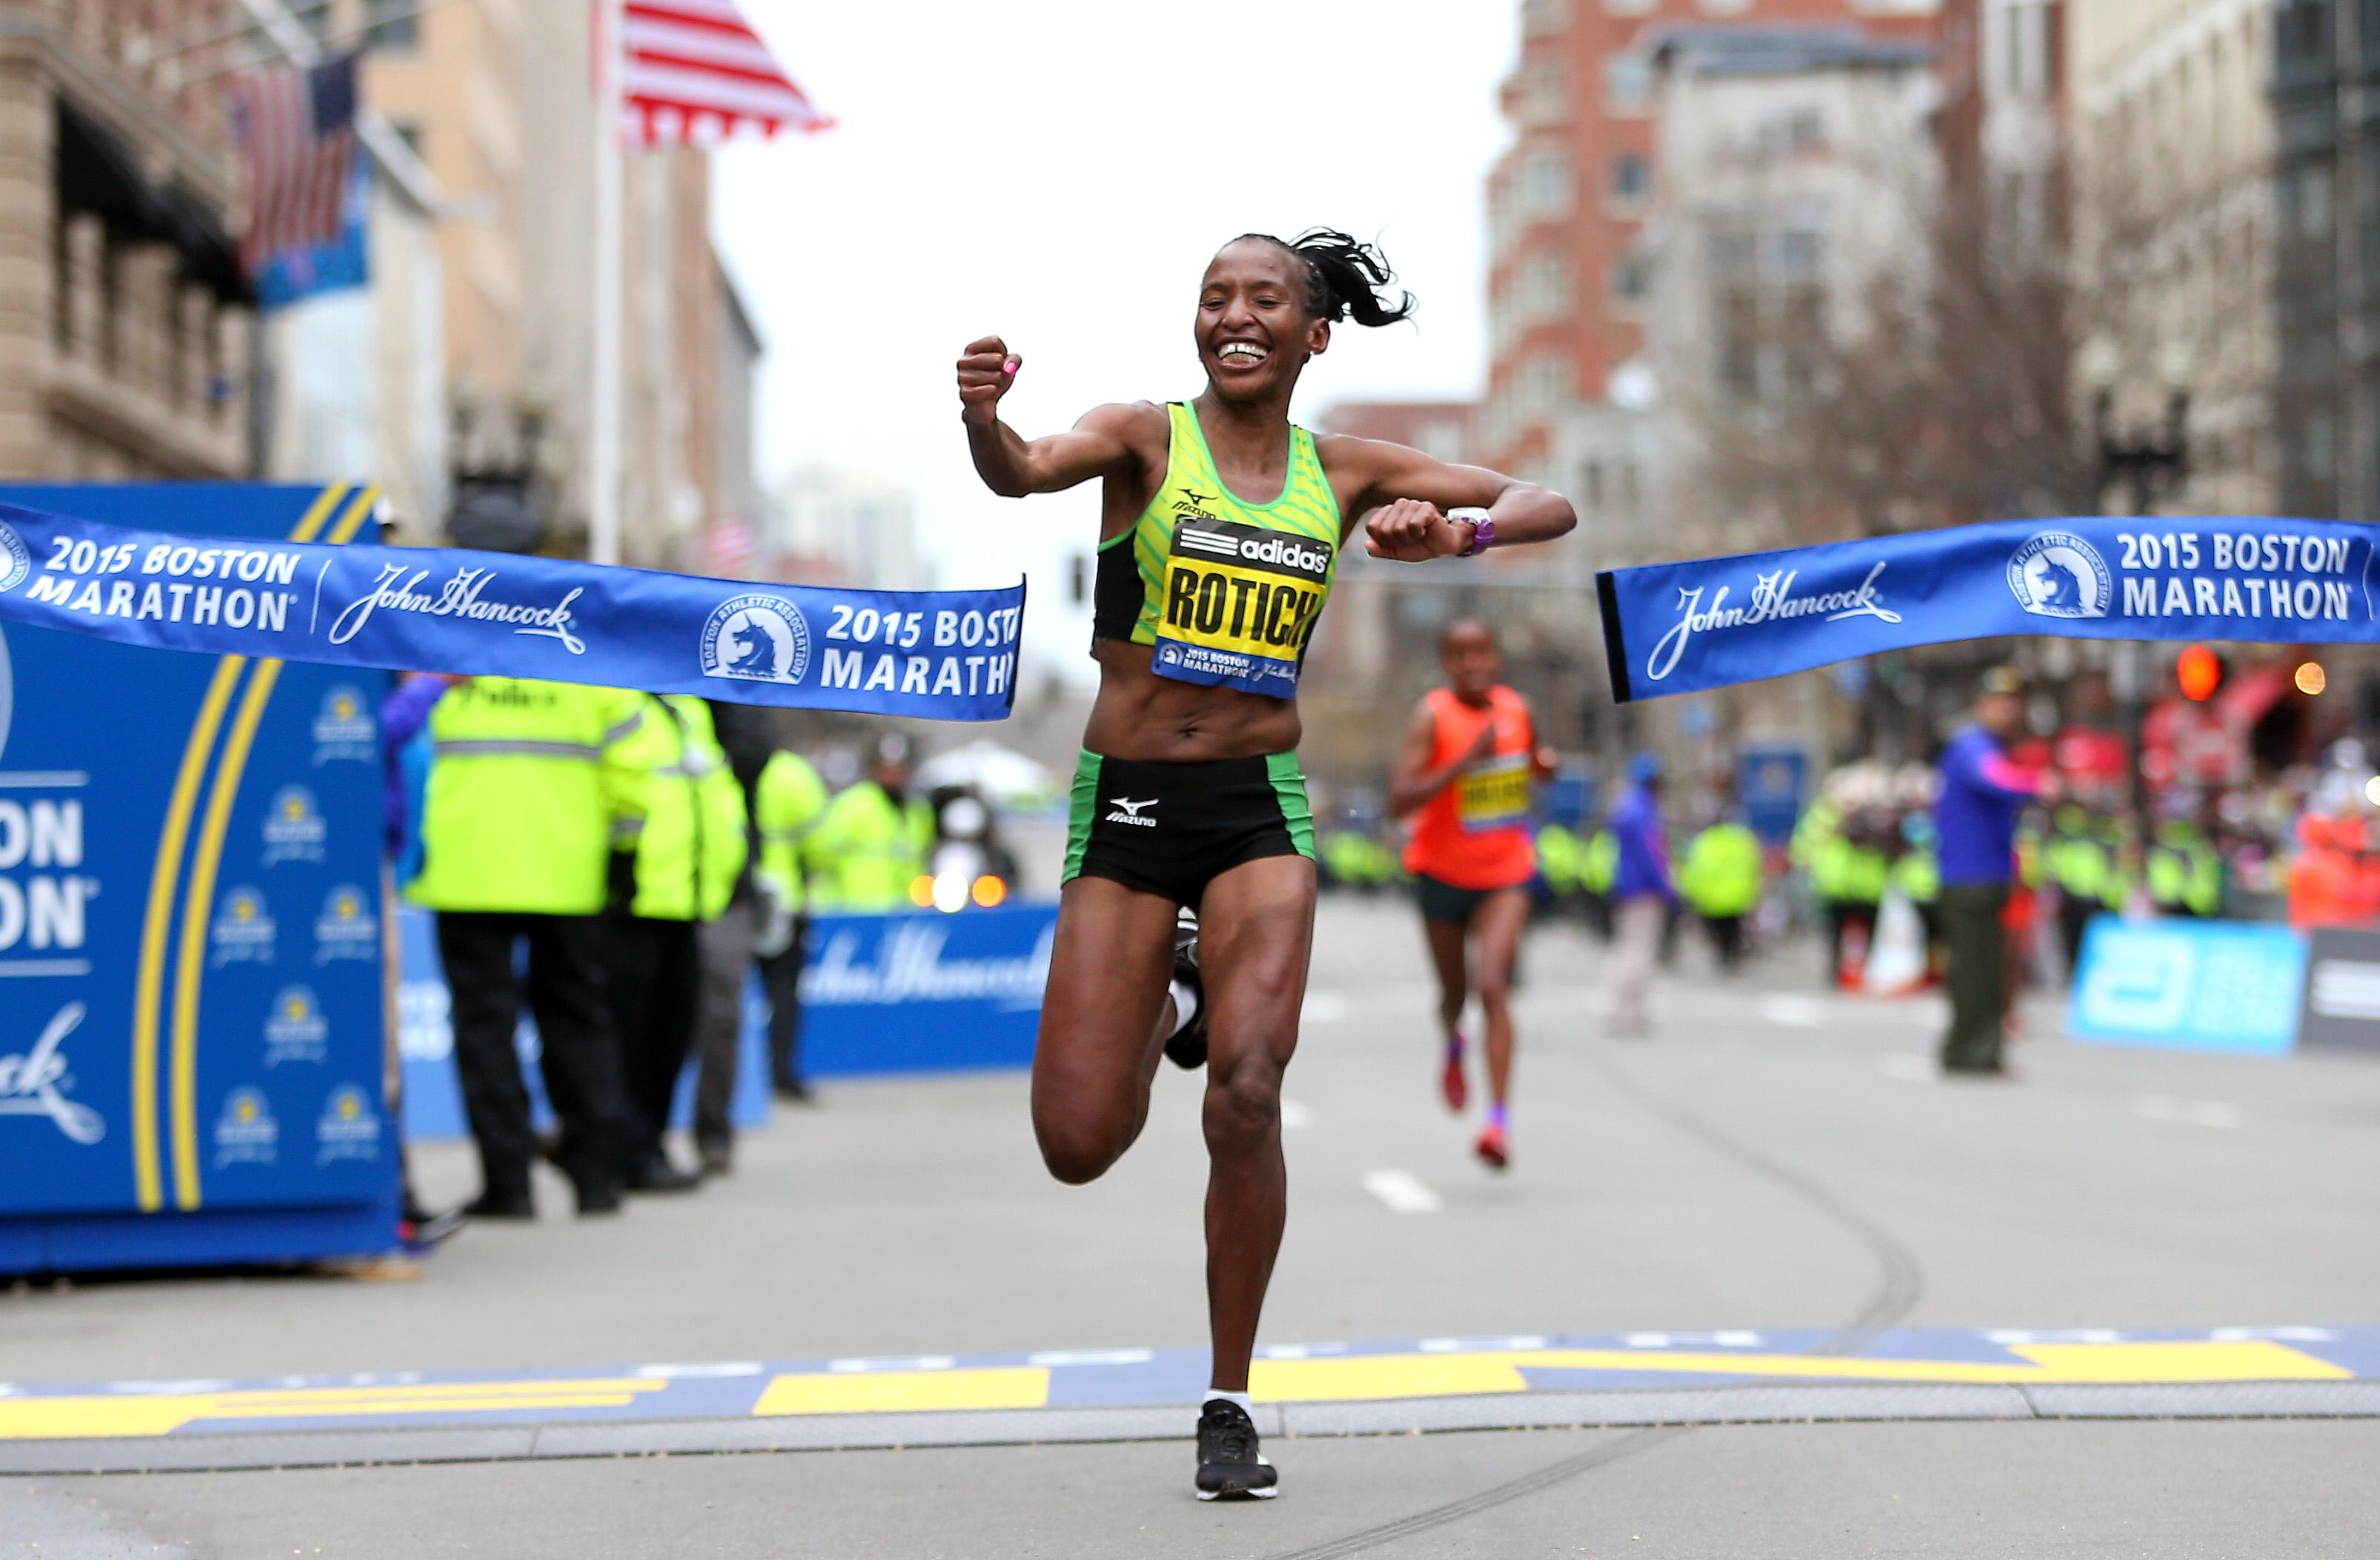 Caroline Rotich of Kenya crosses the finish line to win the 119th Boston Marathon on April 20, 2015 in Boston, Massachusetts.